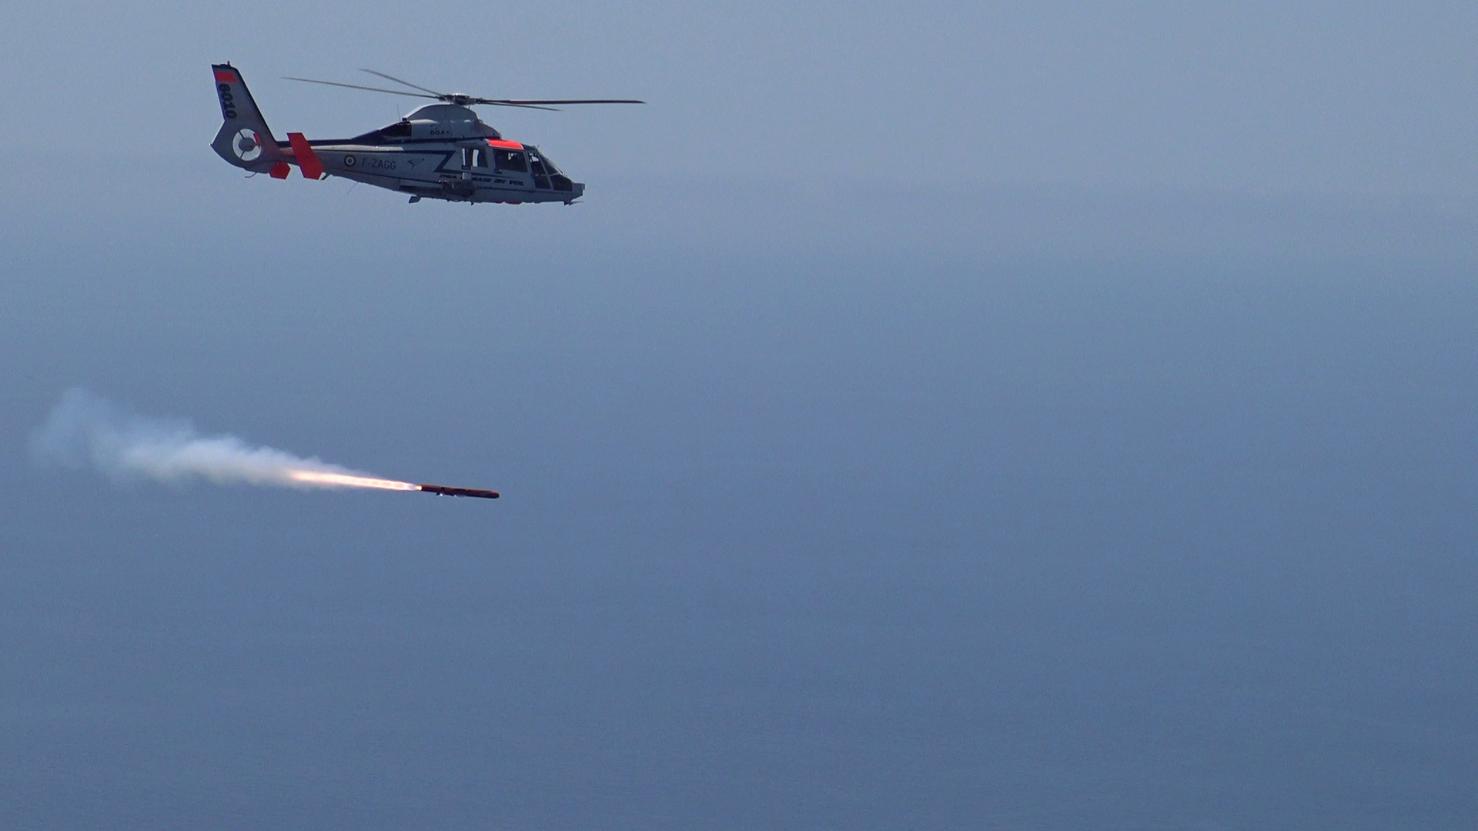 First firing for MBDA's Sea Venom/ANL missile